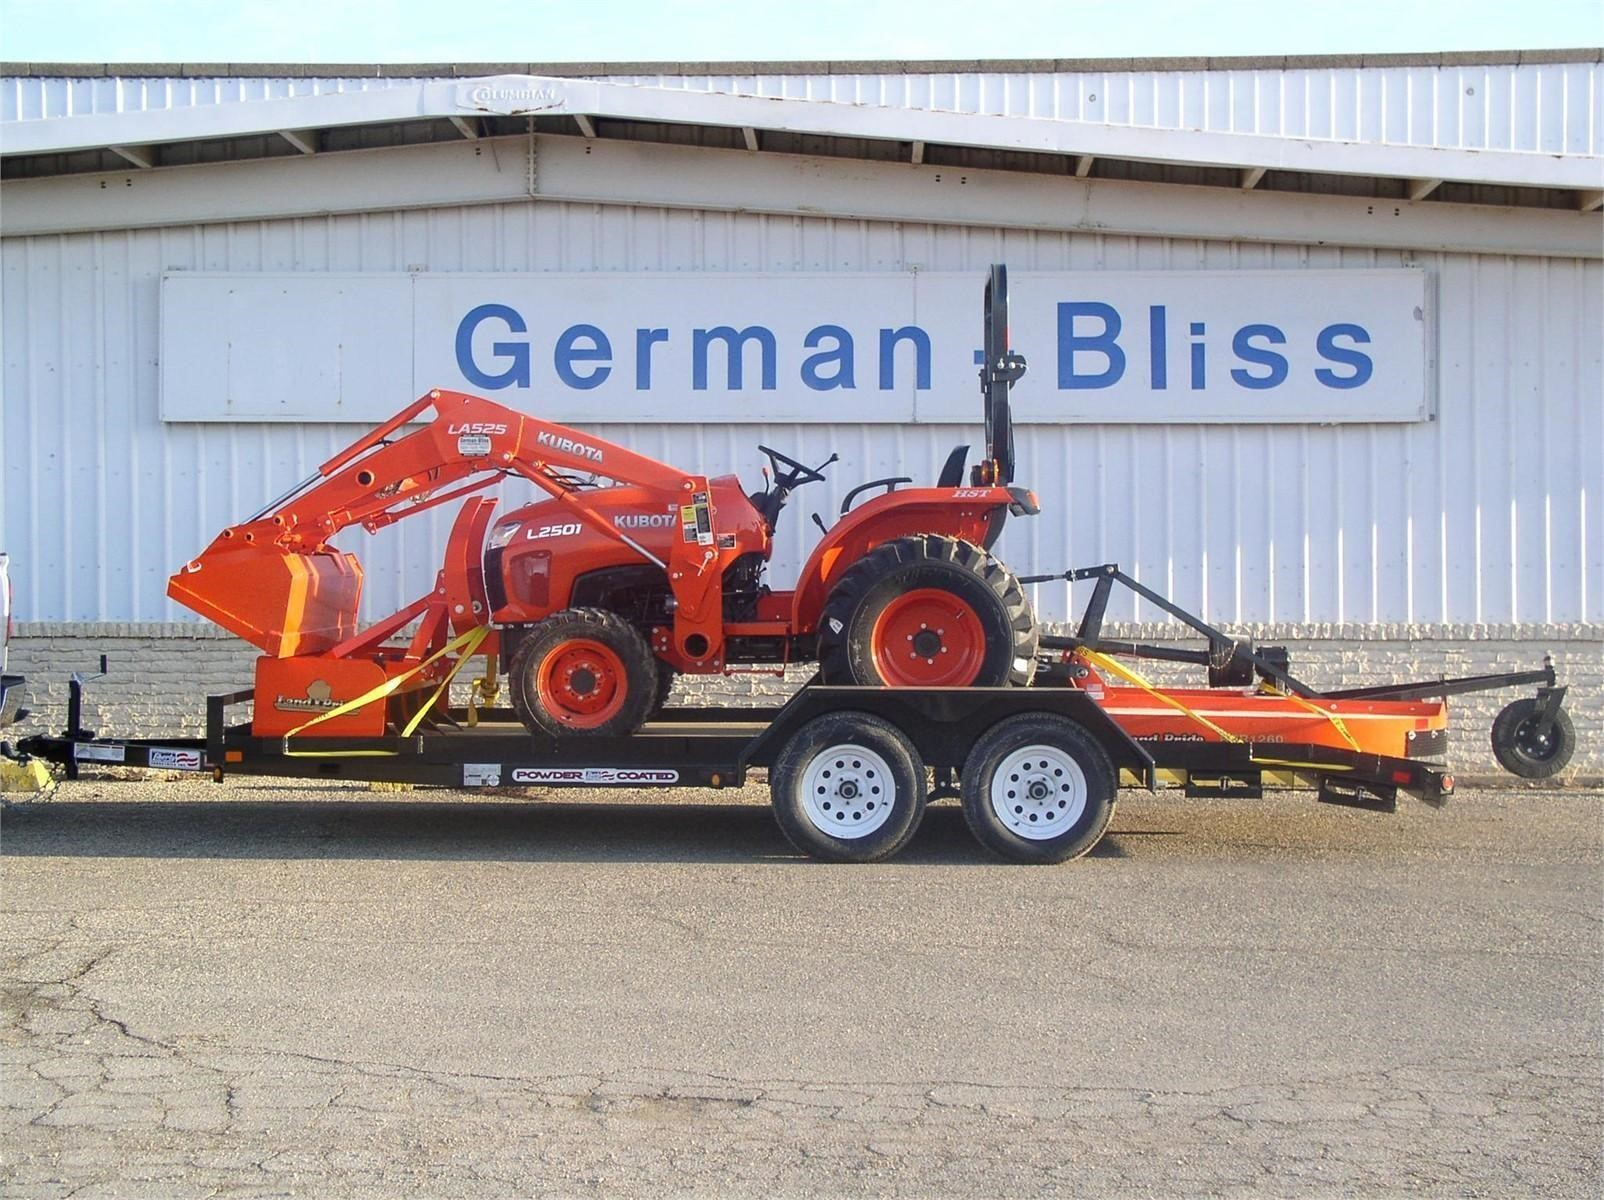 2021 Kubota L2501 Tractor